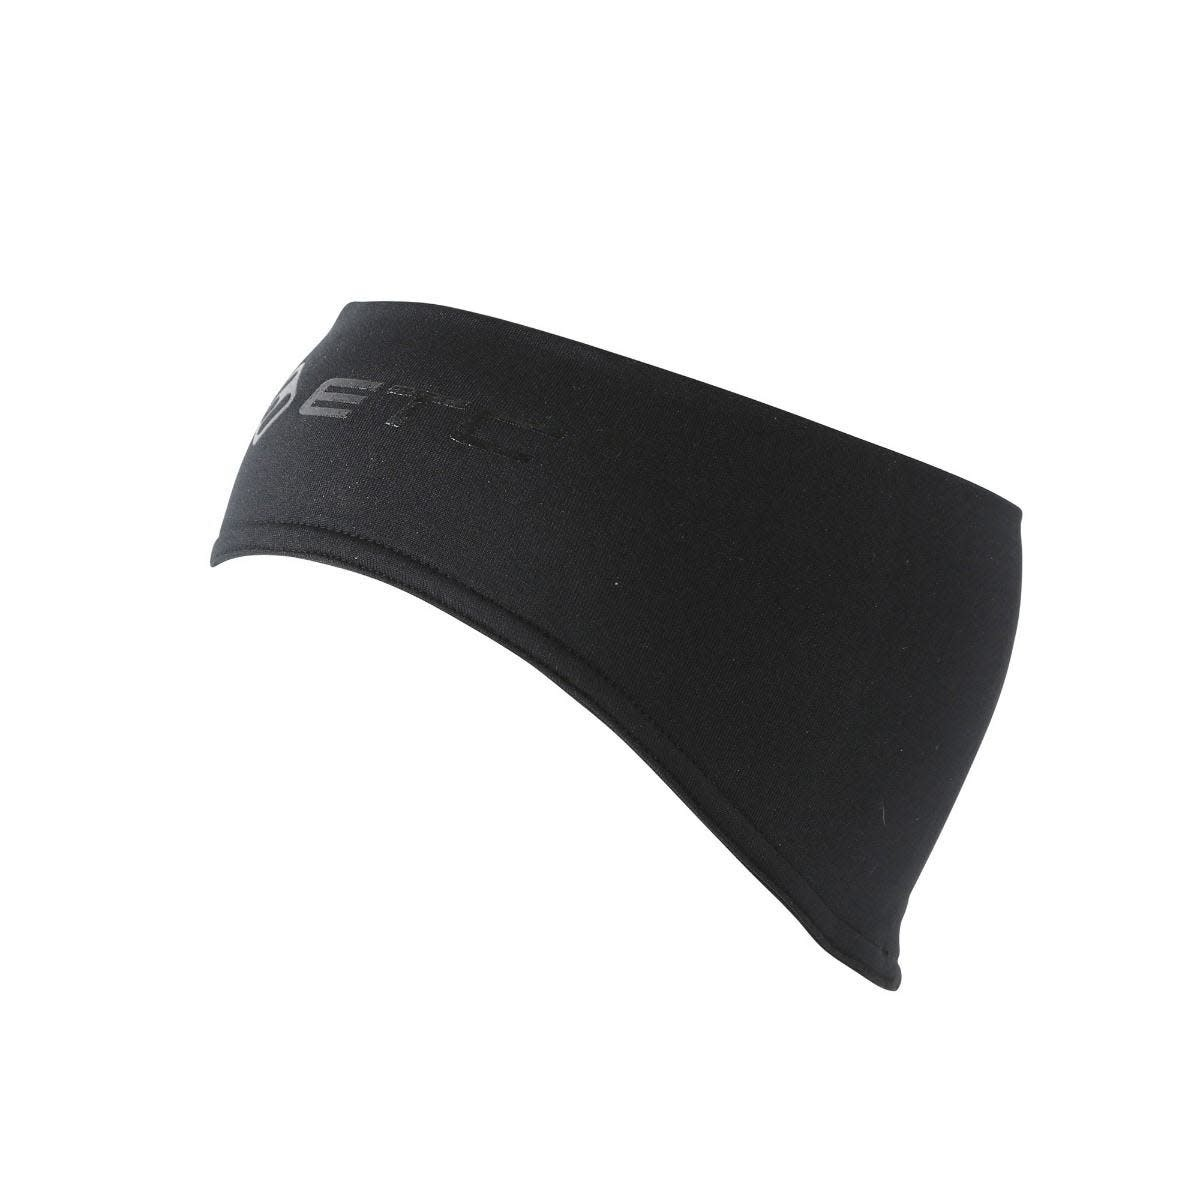 ETC Snug Winter Head Warmer One Size